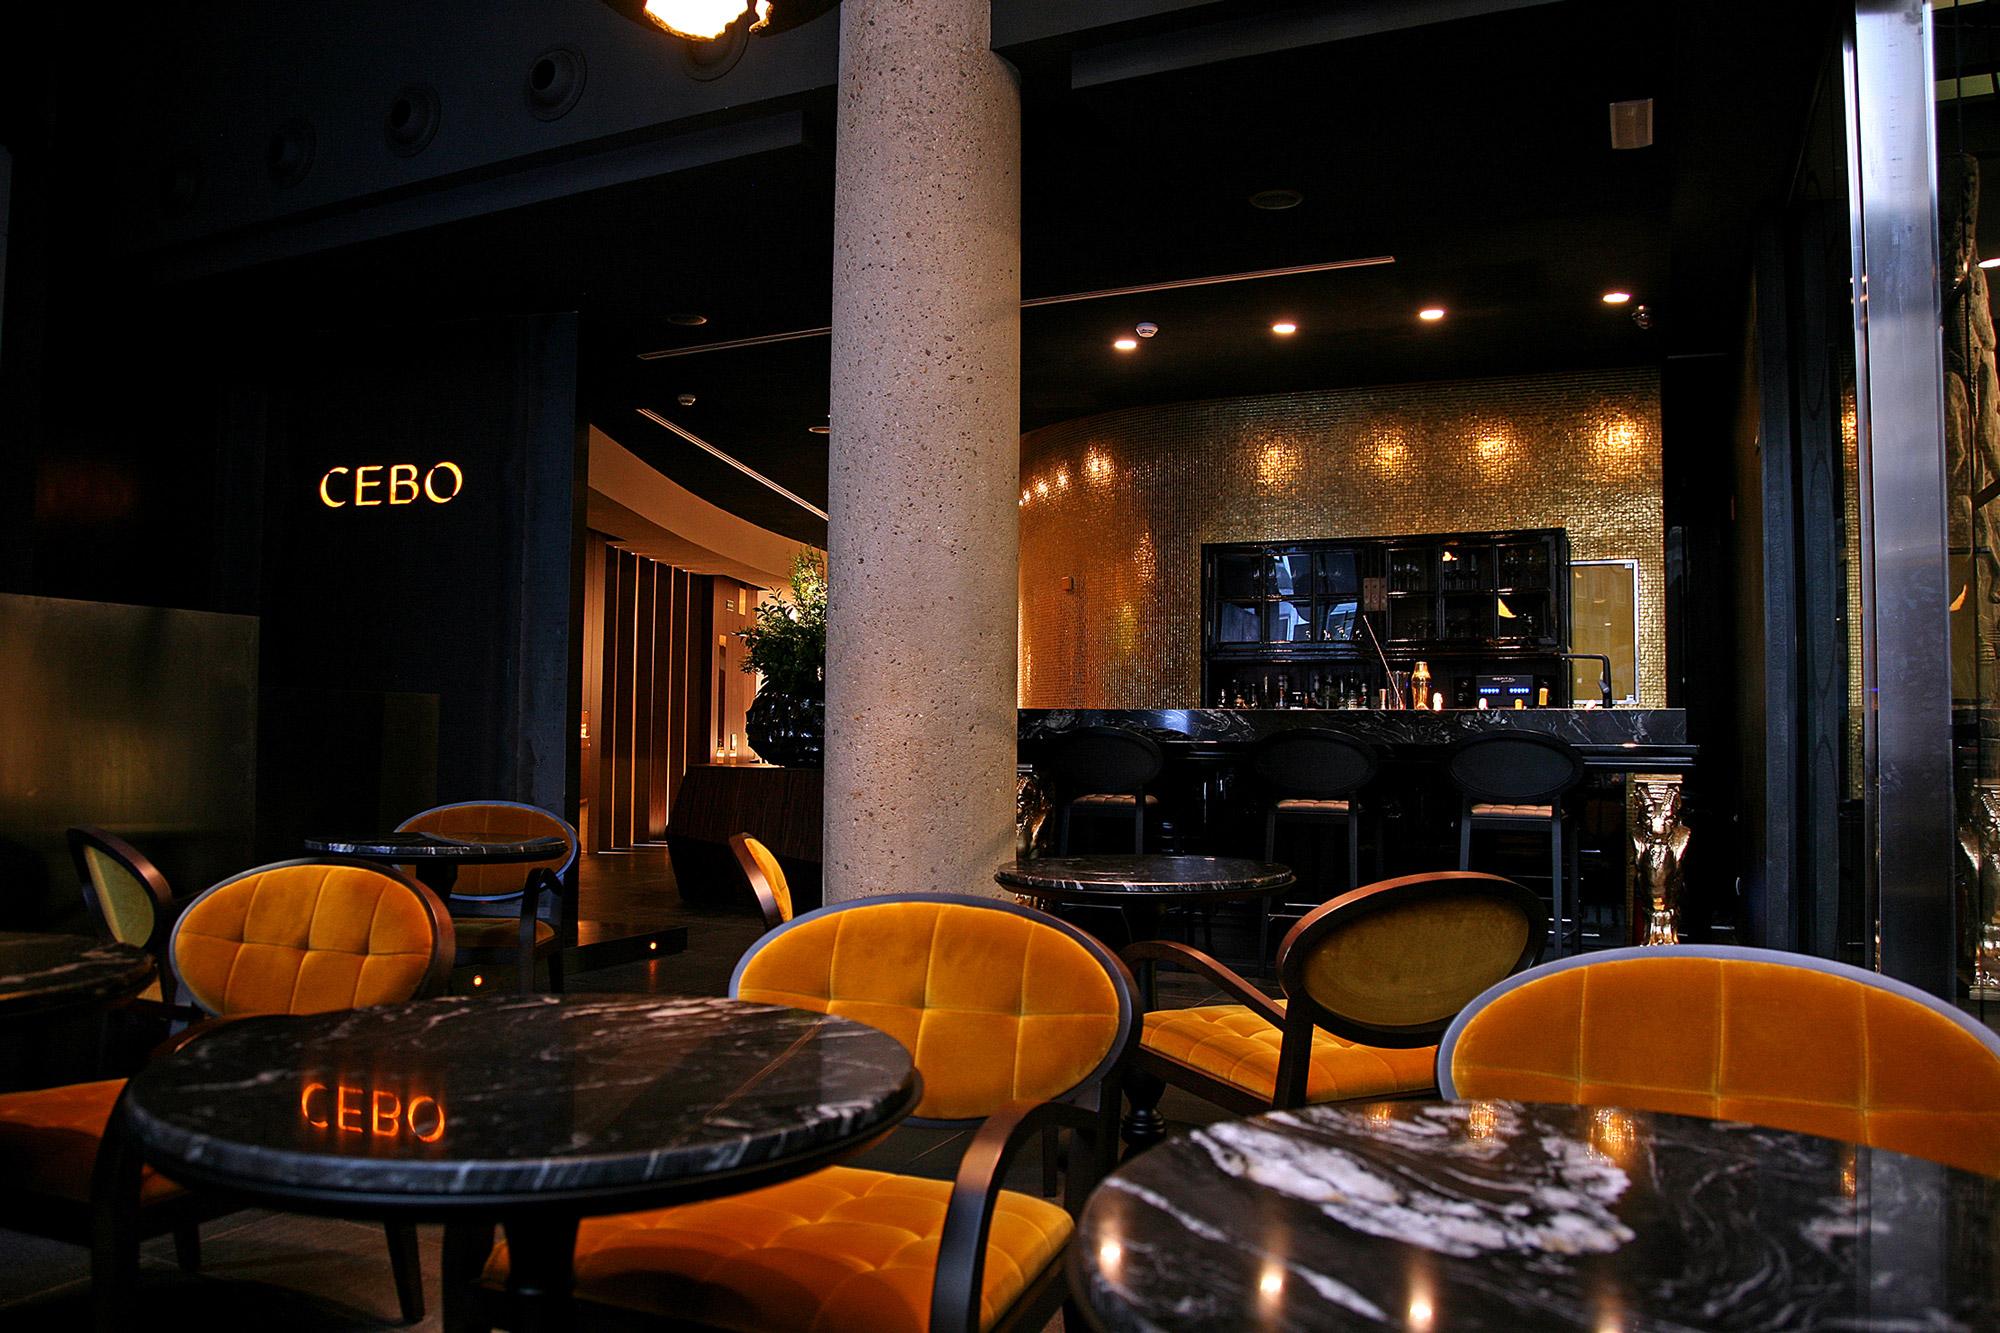 CEBO Restaurant Madrid